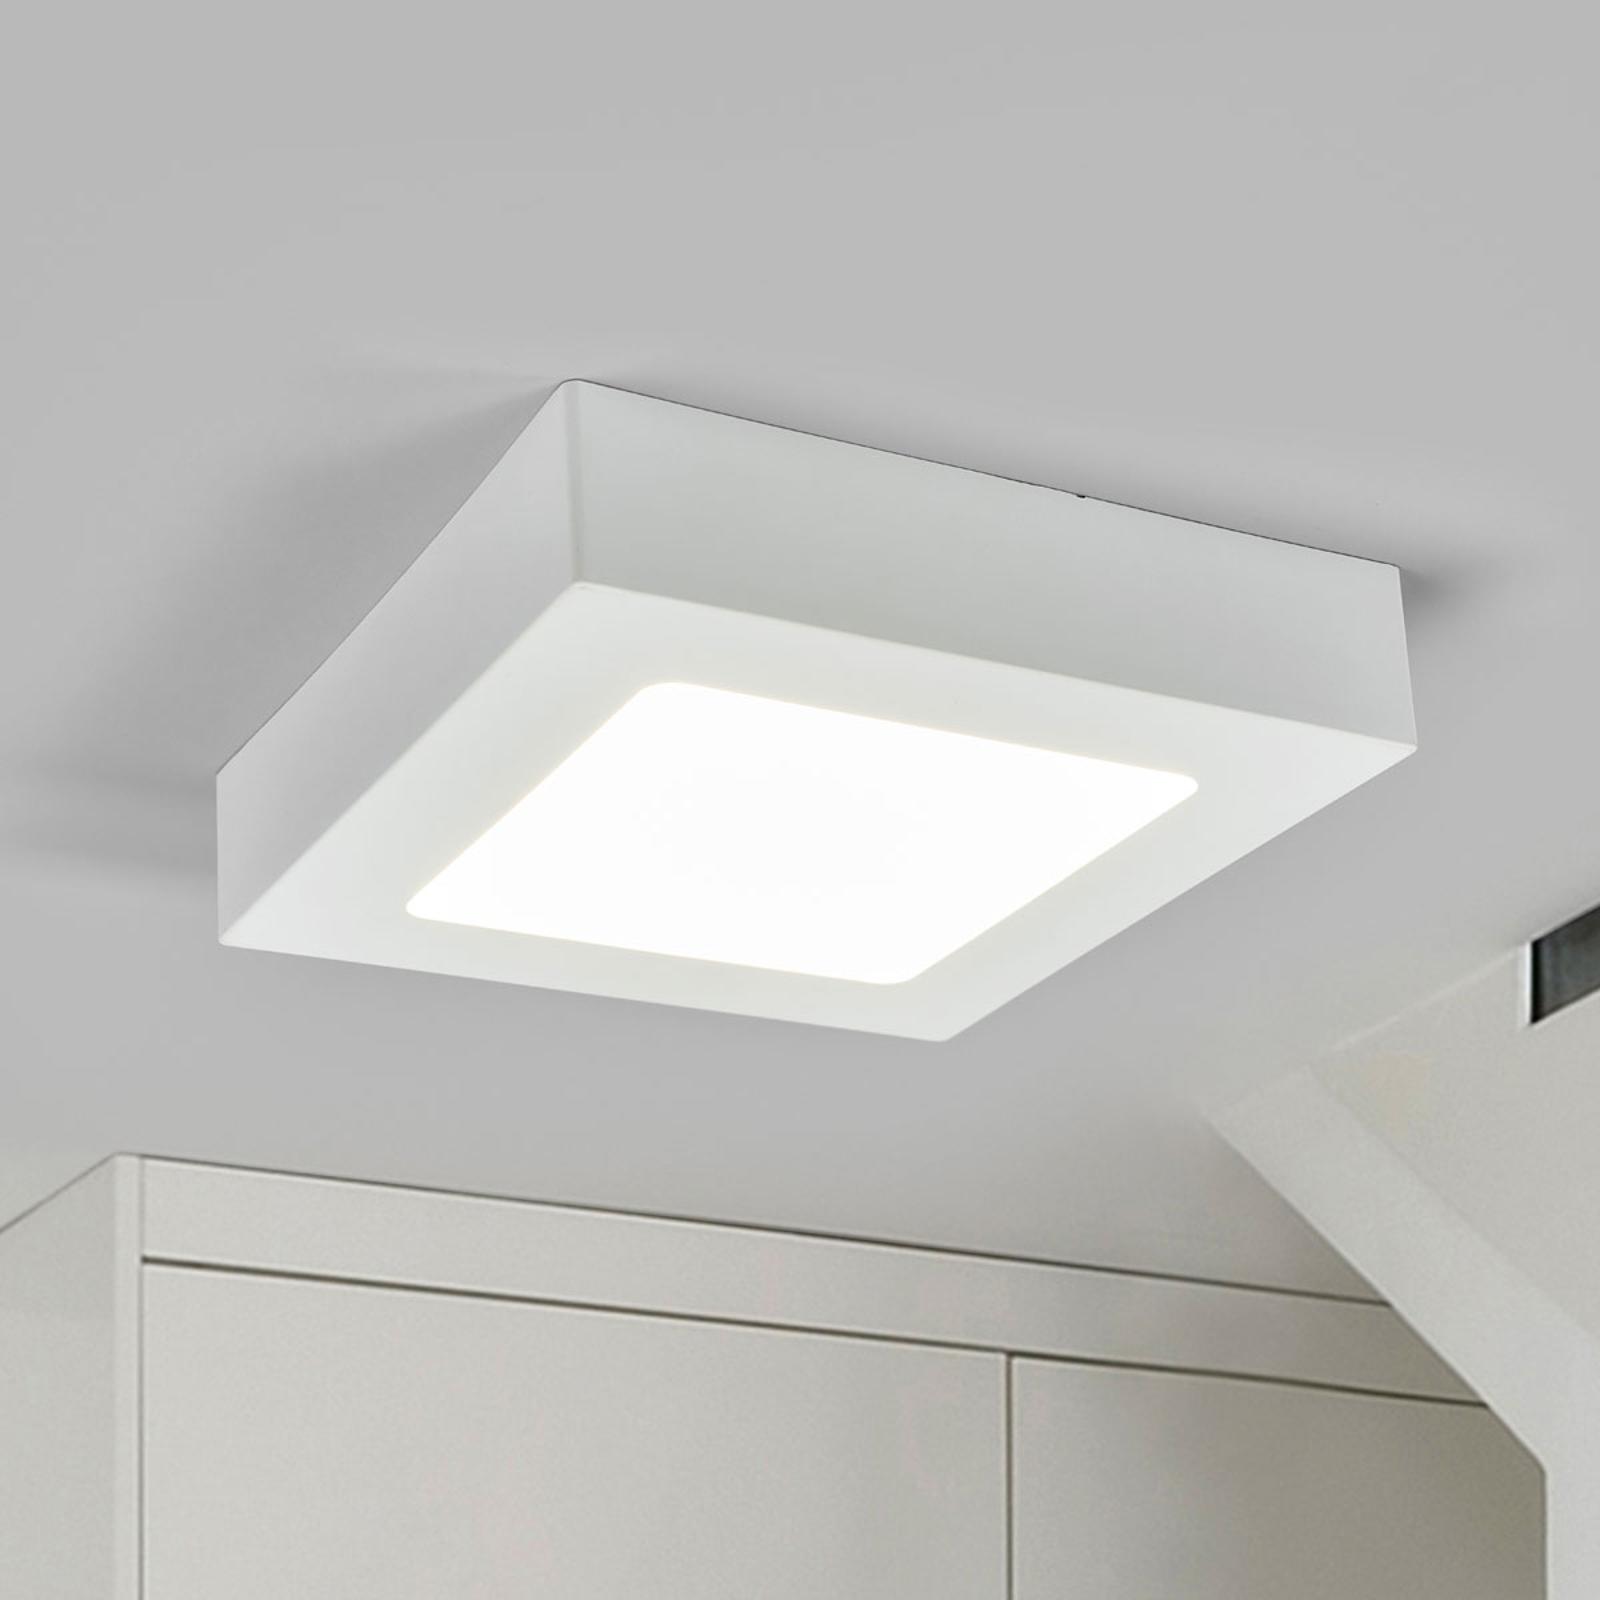 Marlo LED ceiling lamp white 4000K angular 18.1cm_9978067_1